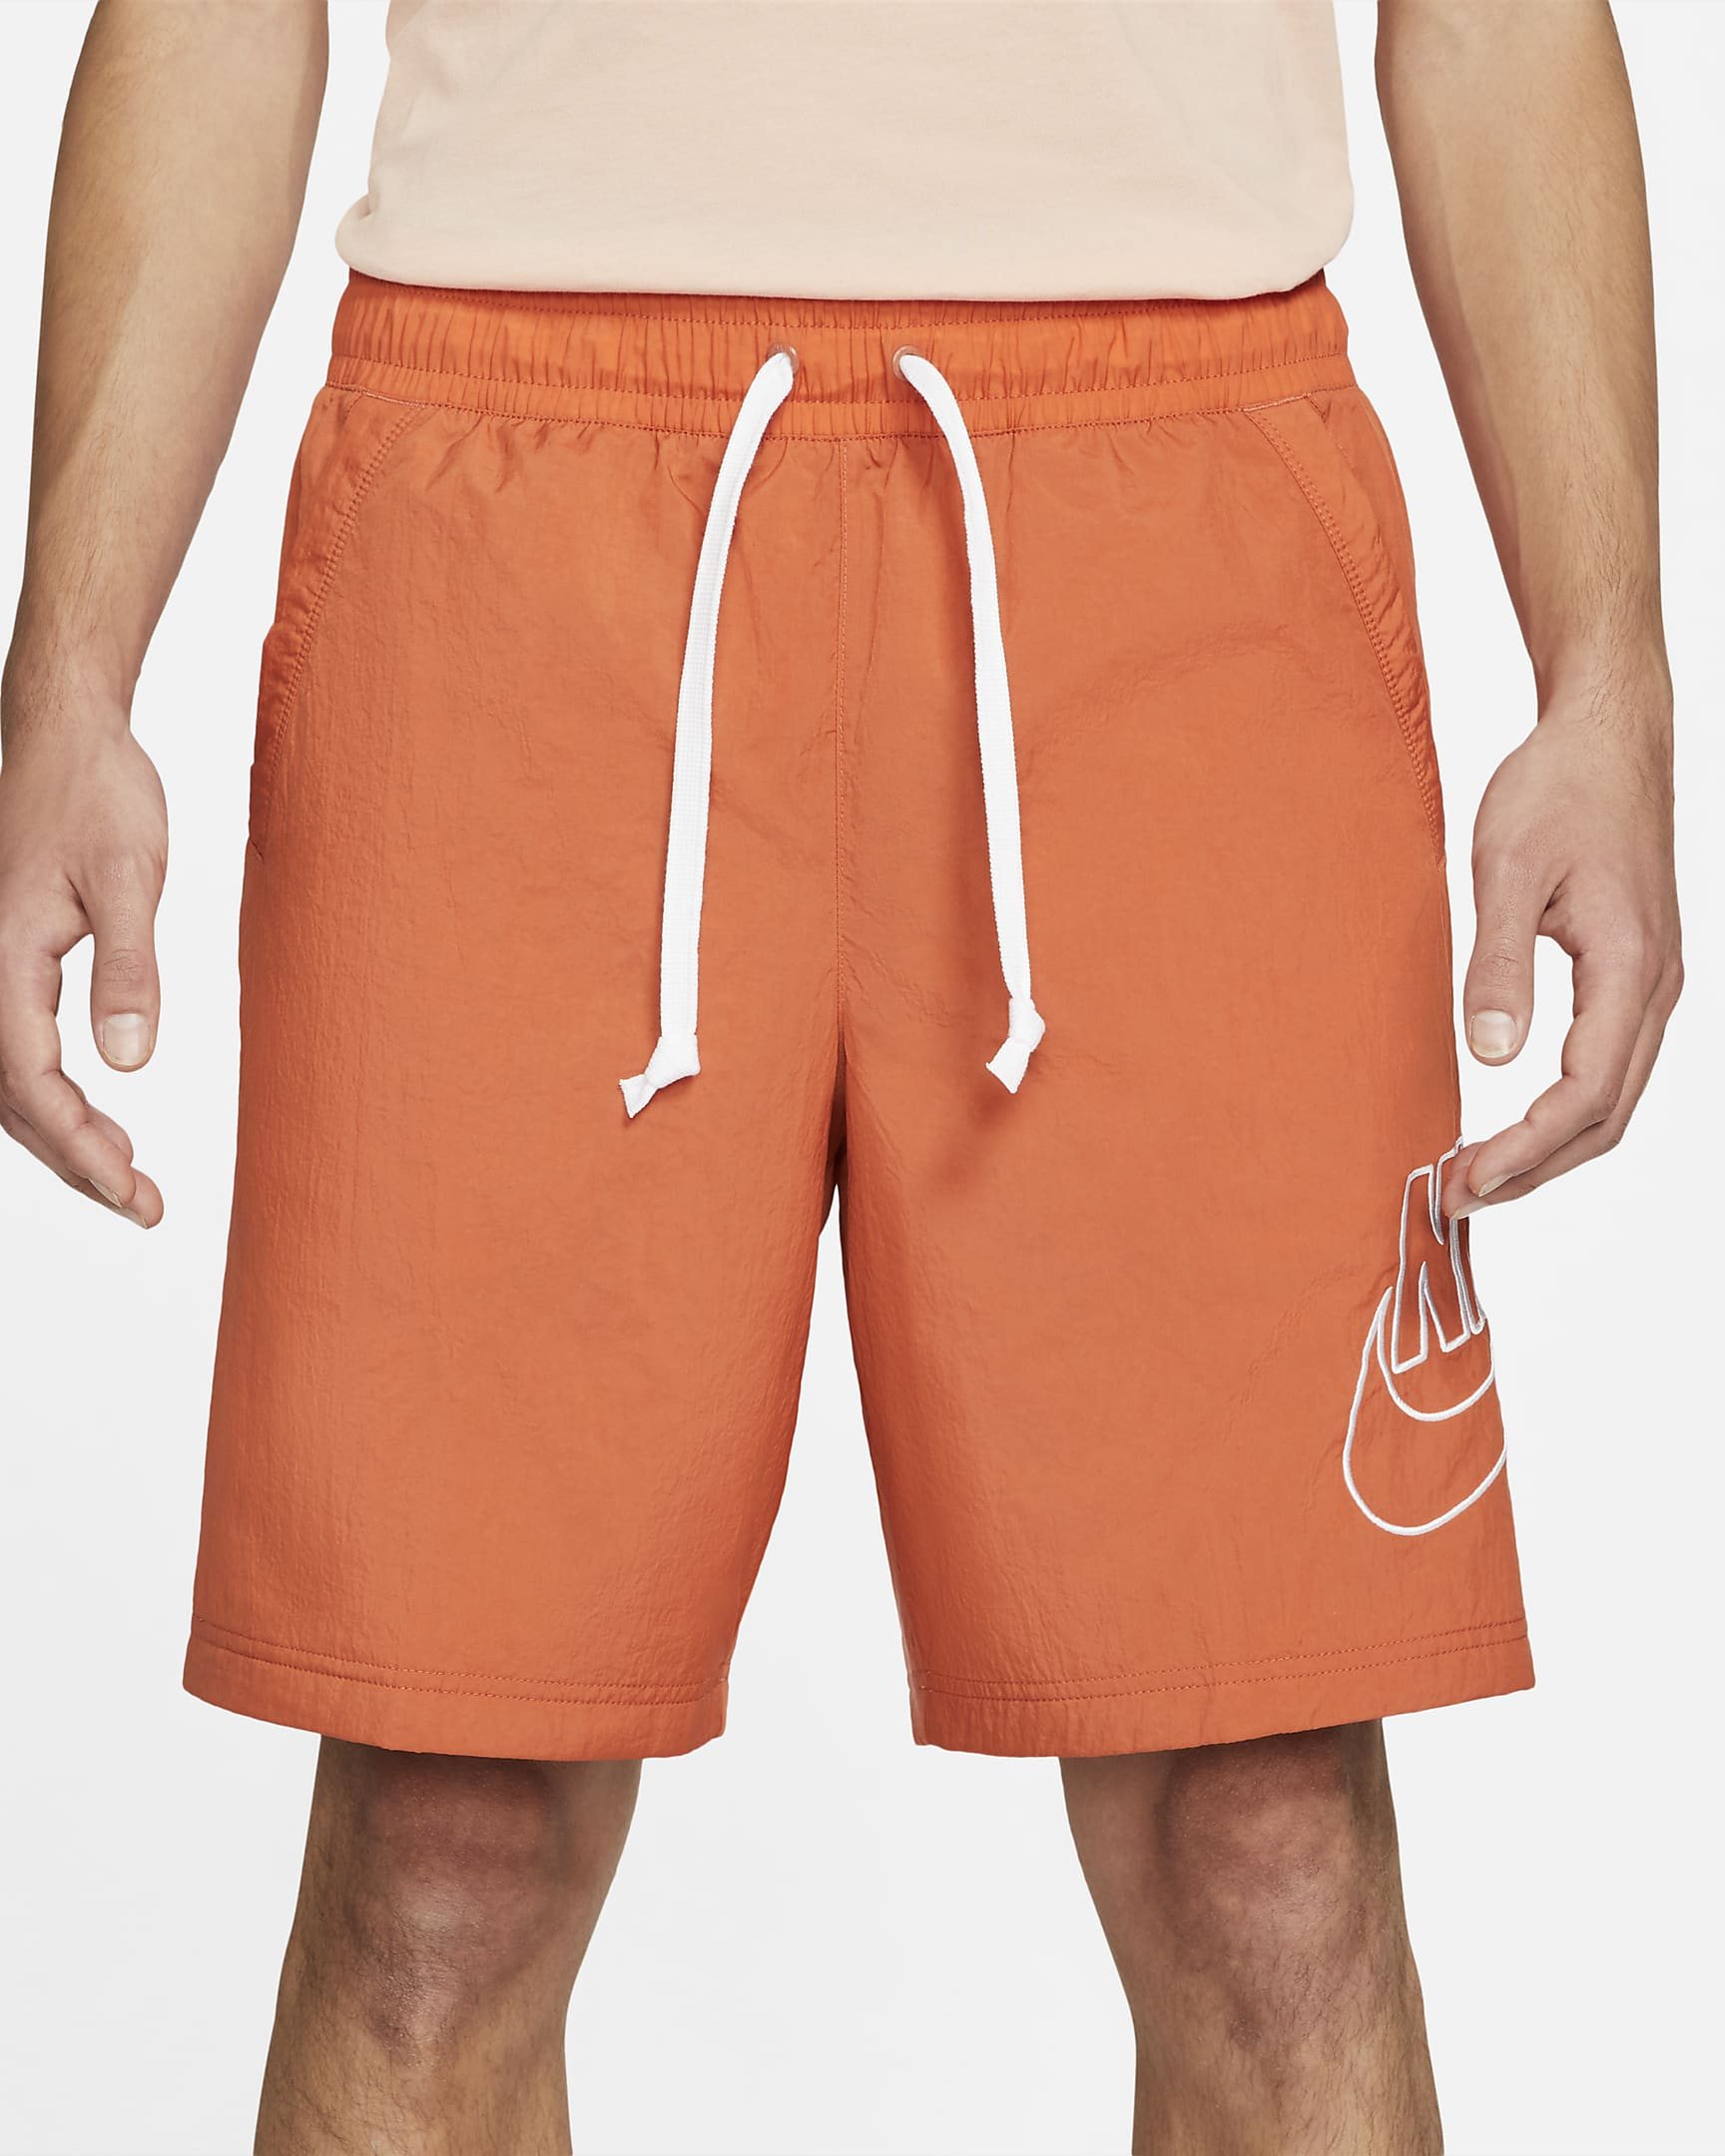 sportswear-alumni-mens-woven-shorts-Ck28PB.png